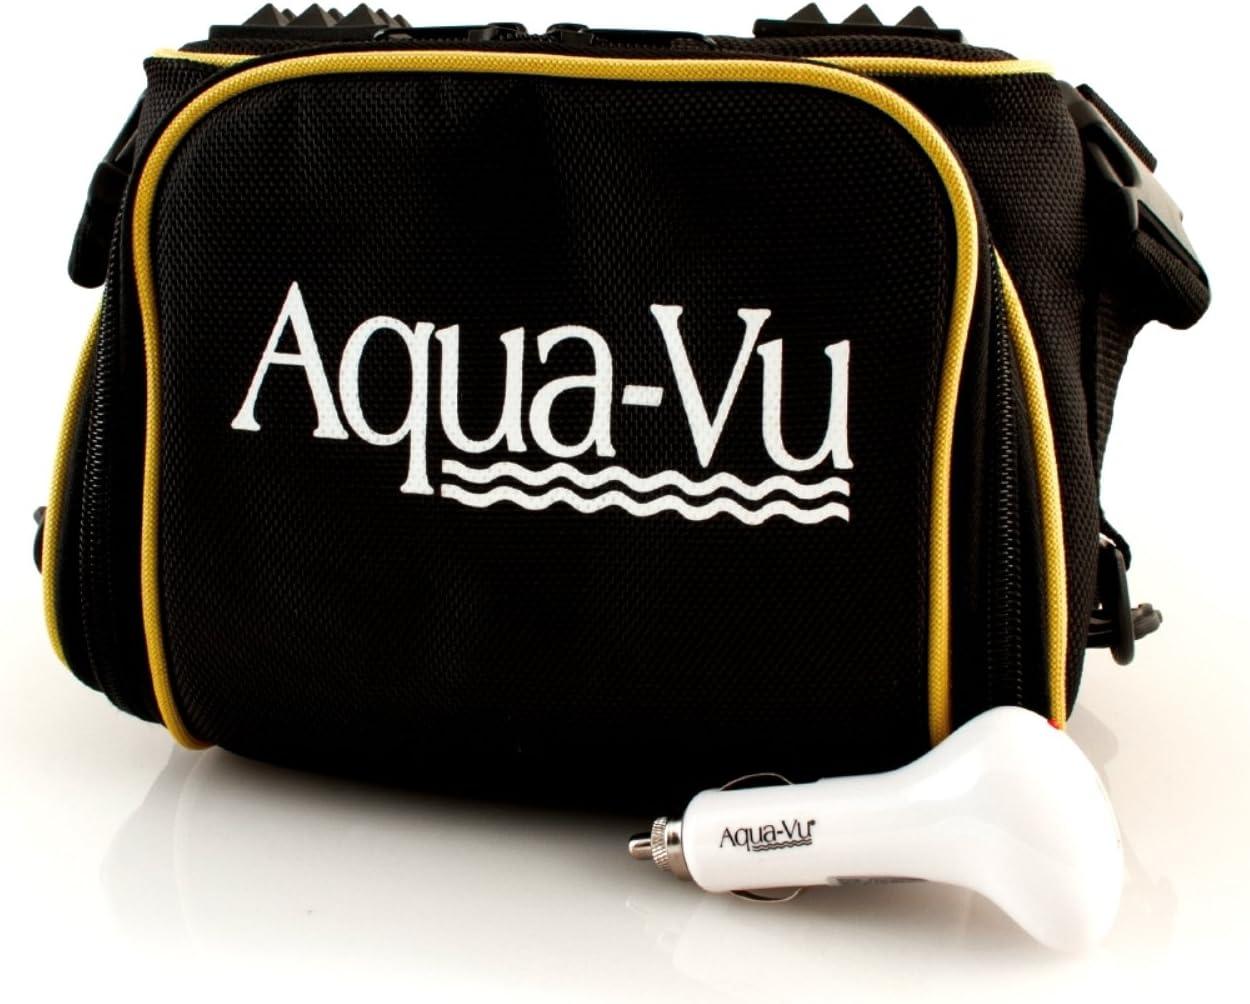 Aqua Vu Micro-Mobile Pro Vu Case and 12v Aux Camera Charger